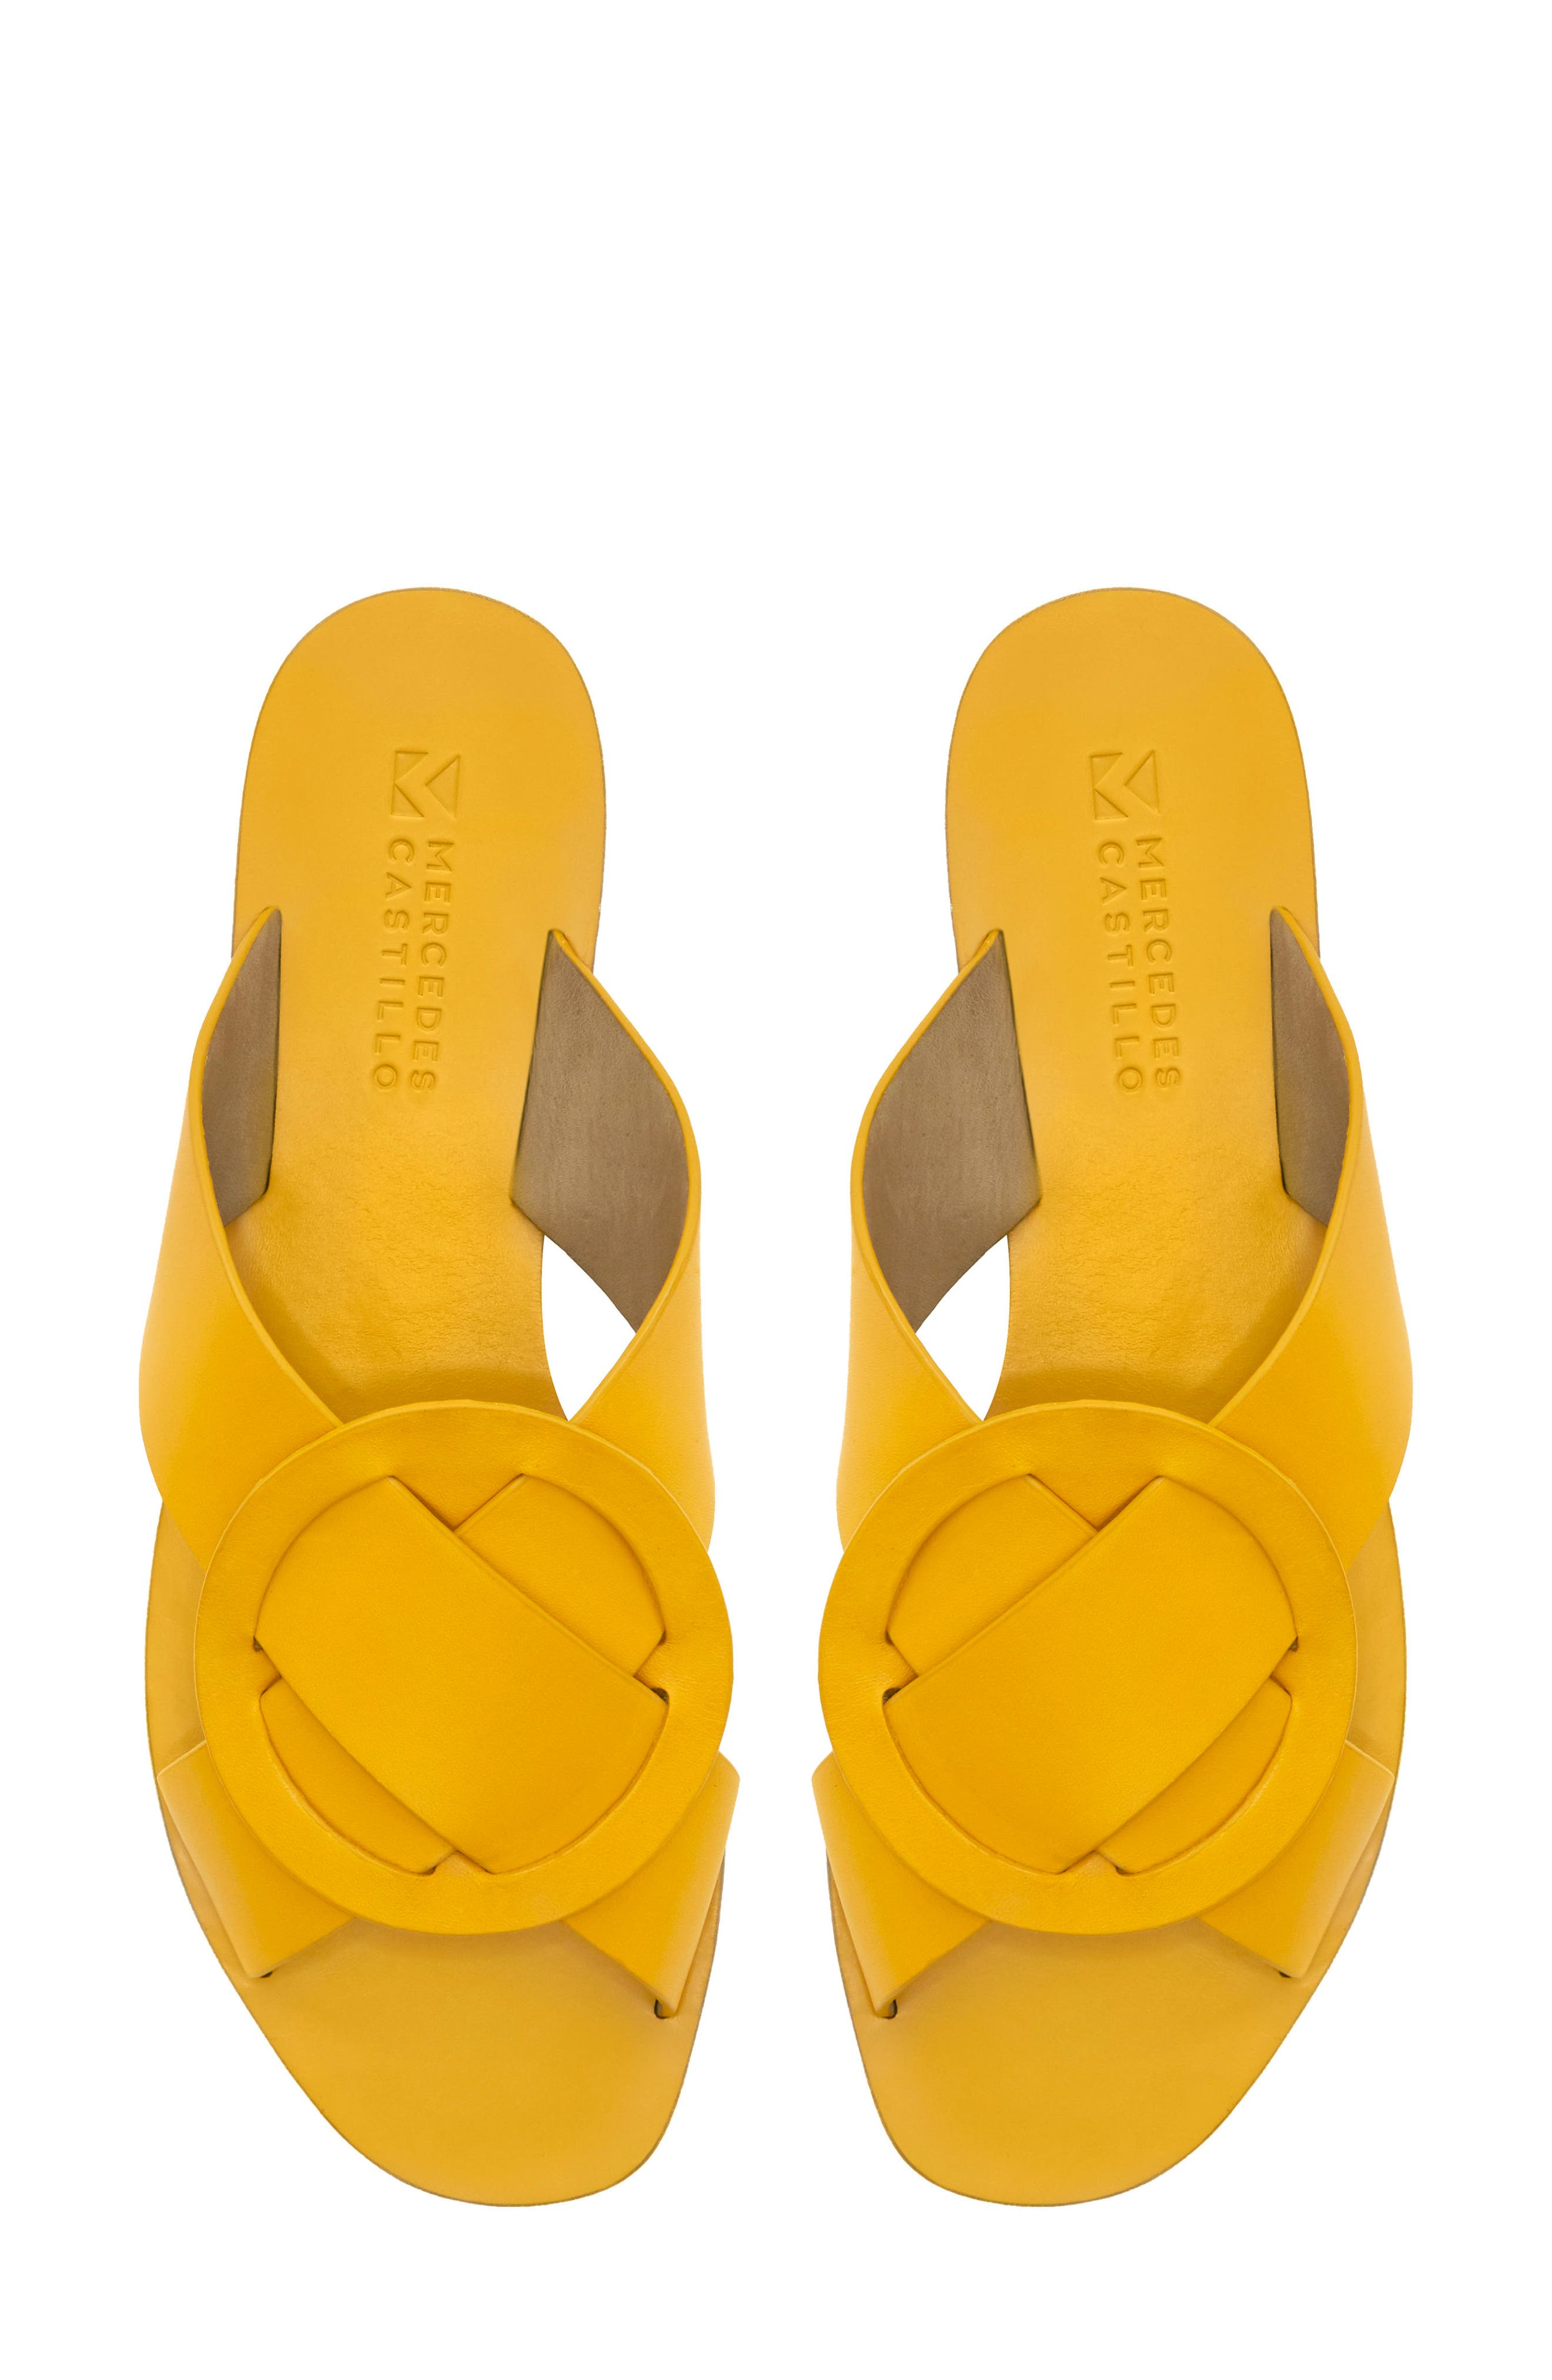 Carlein Slide Sandal,                             Alternate thumbnail 7, color,                             Mustard Leather